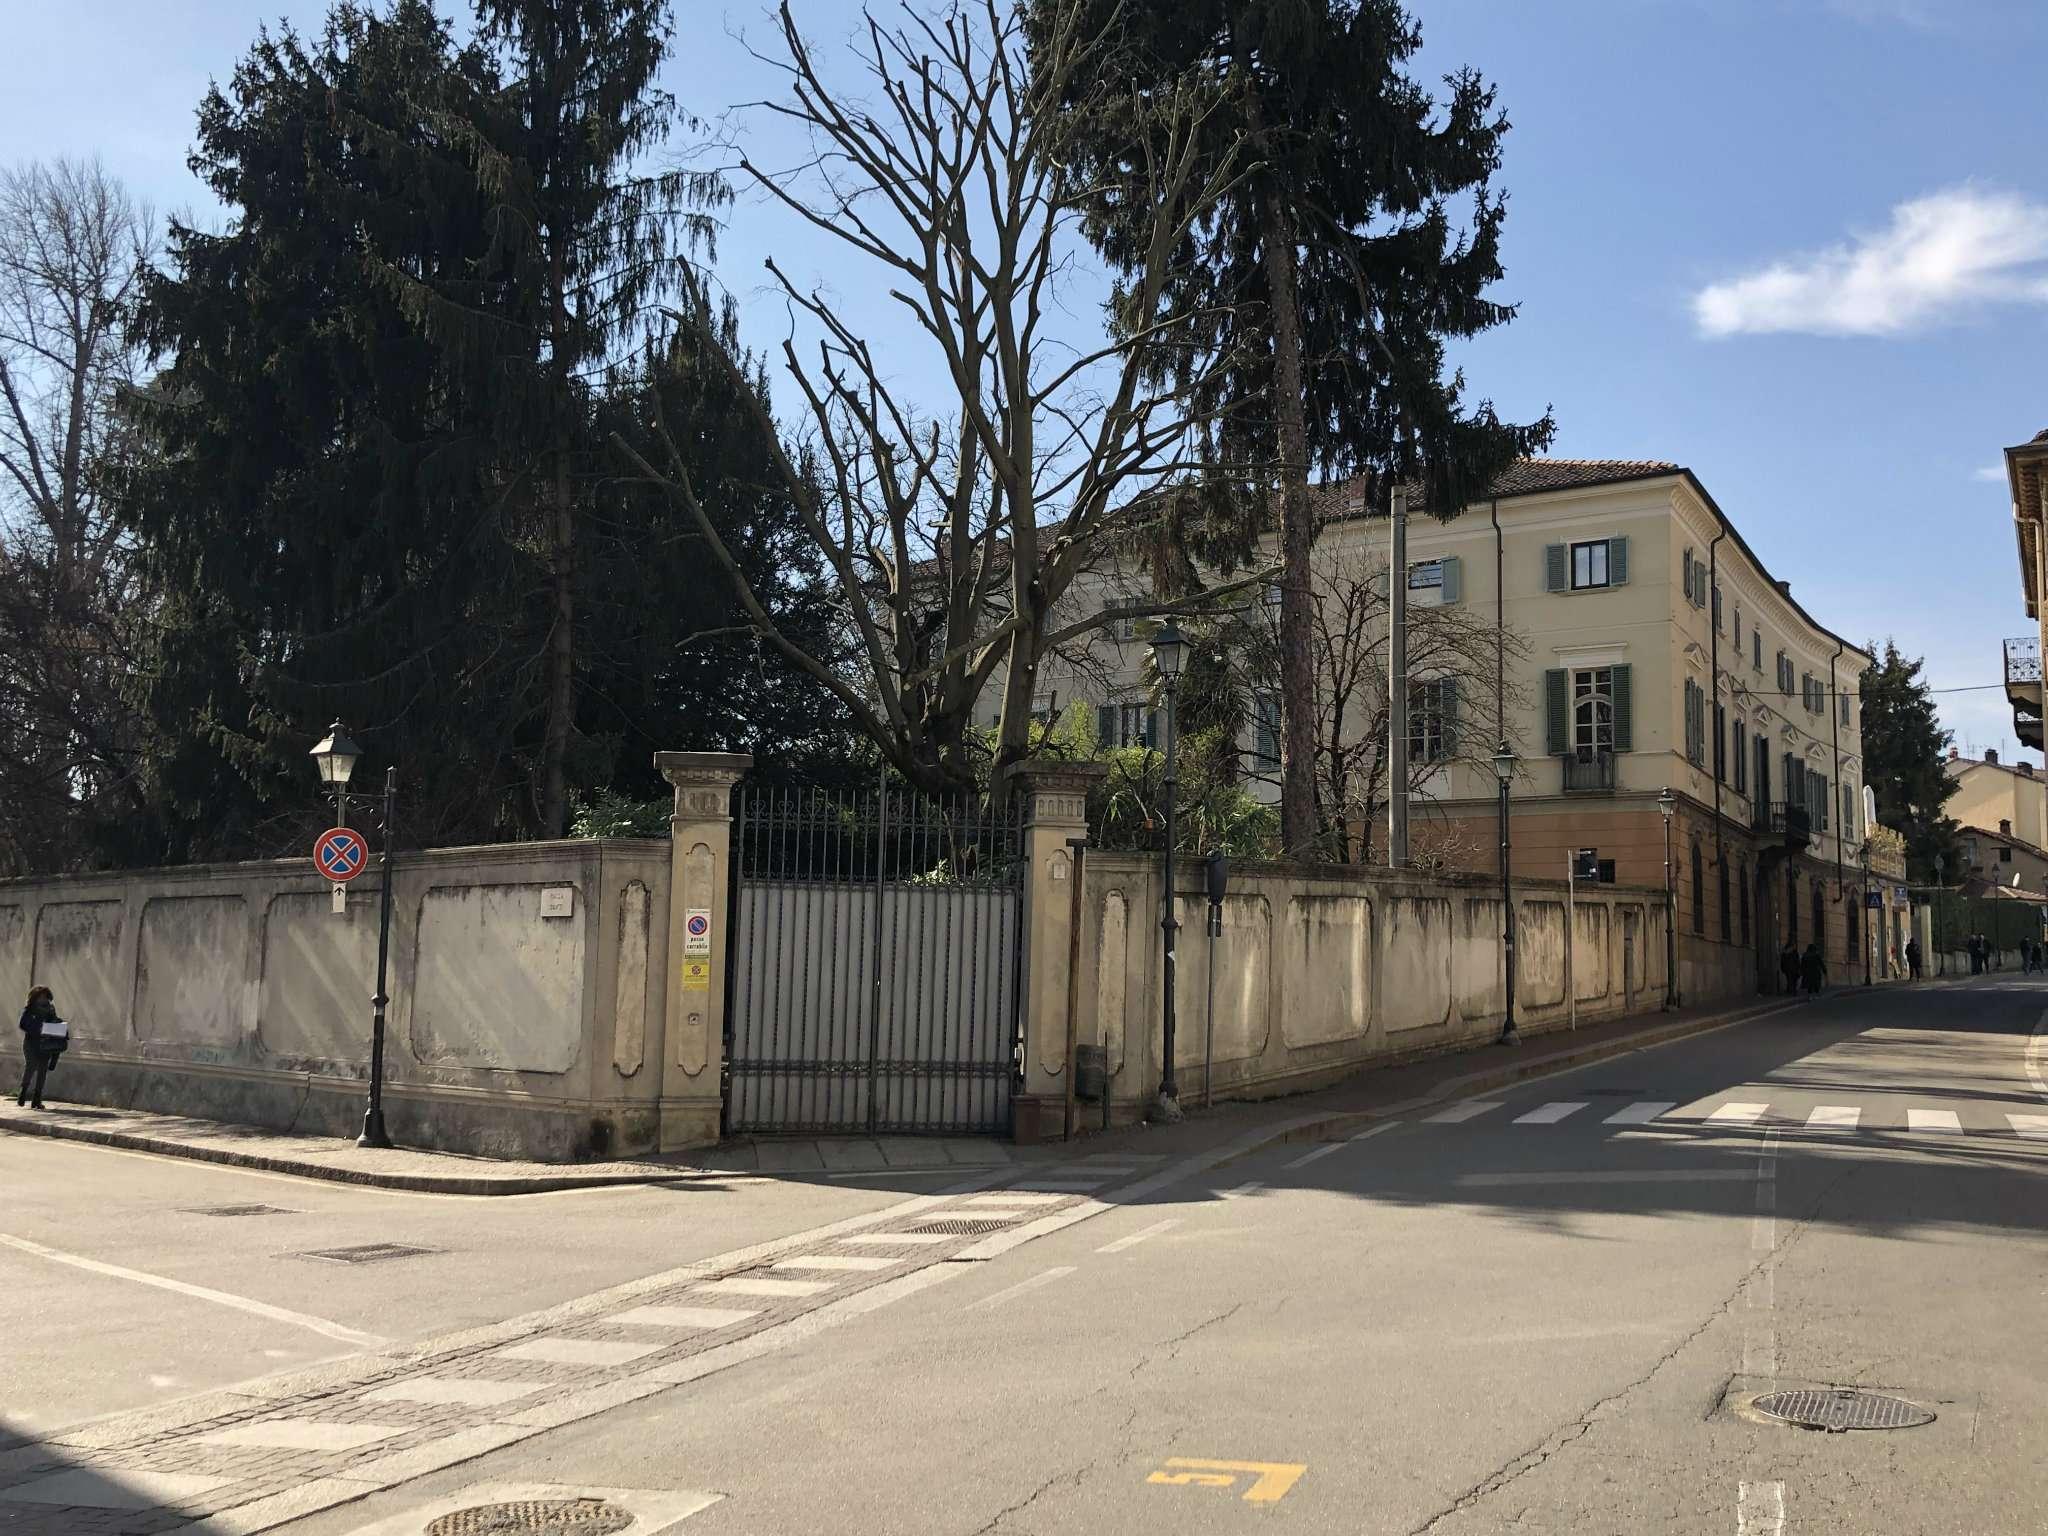 via   vittorio emanuele II 8 - Chieri - PALAZZO D'EPOCA NEL CENTRO STORICO